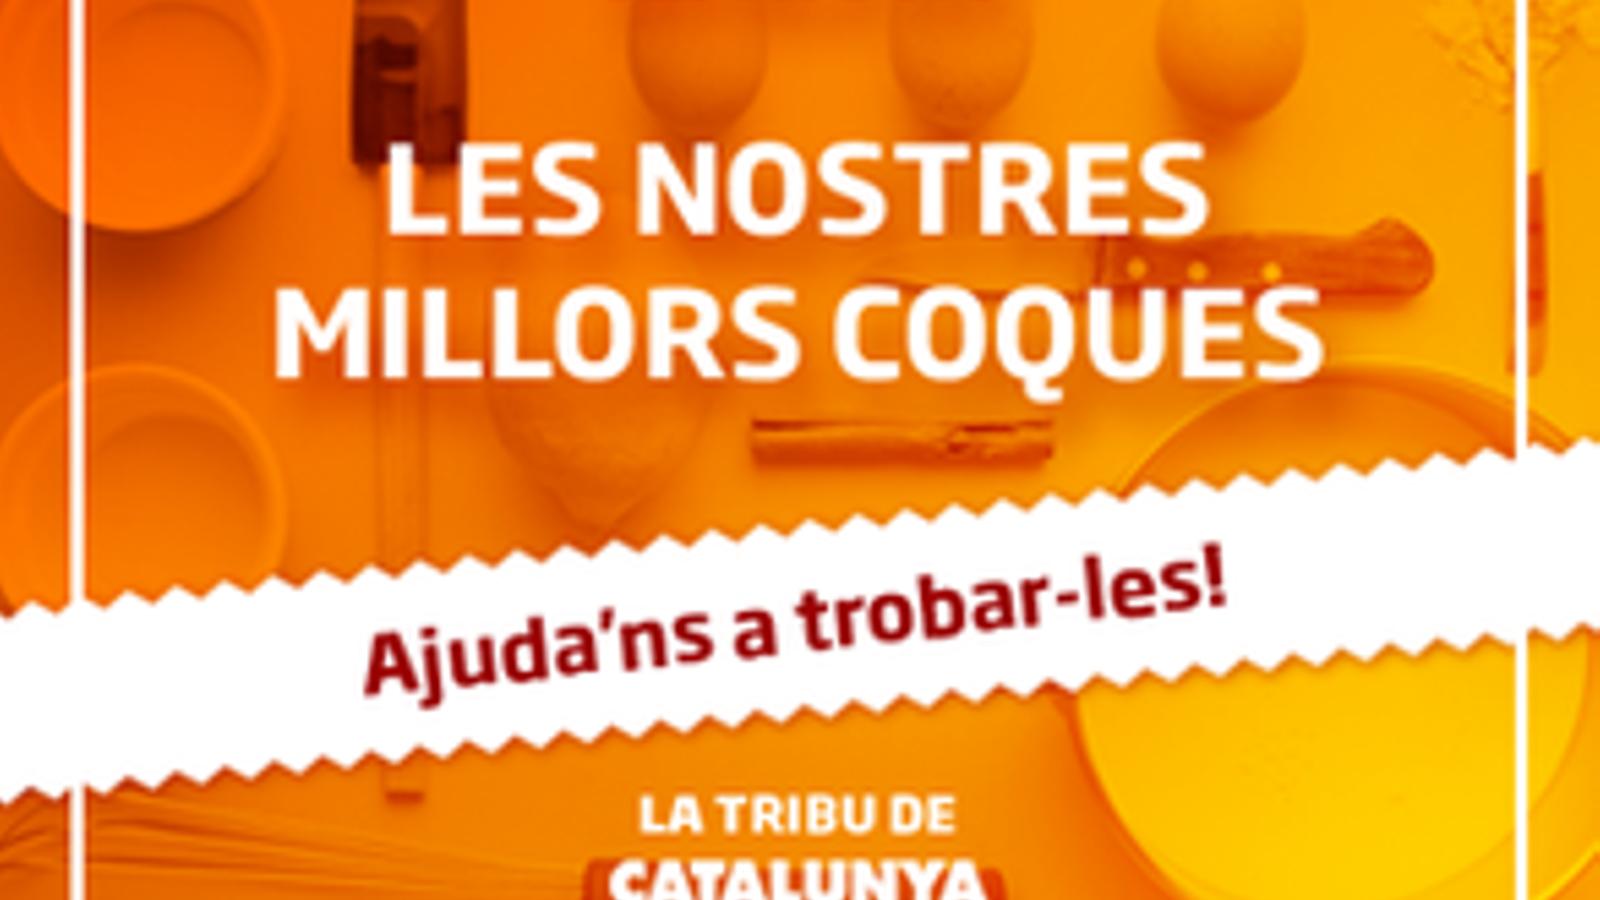 Coques_1549055170_28087640_293x218